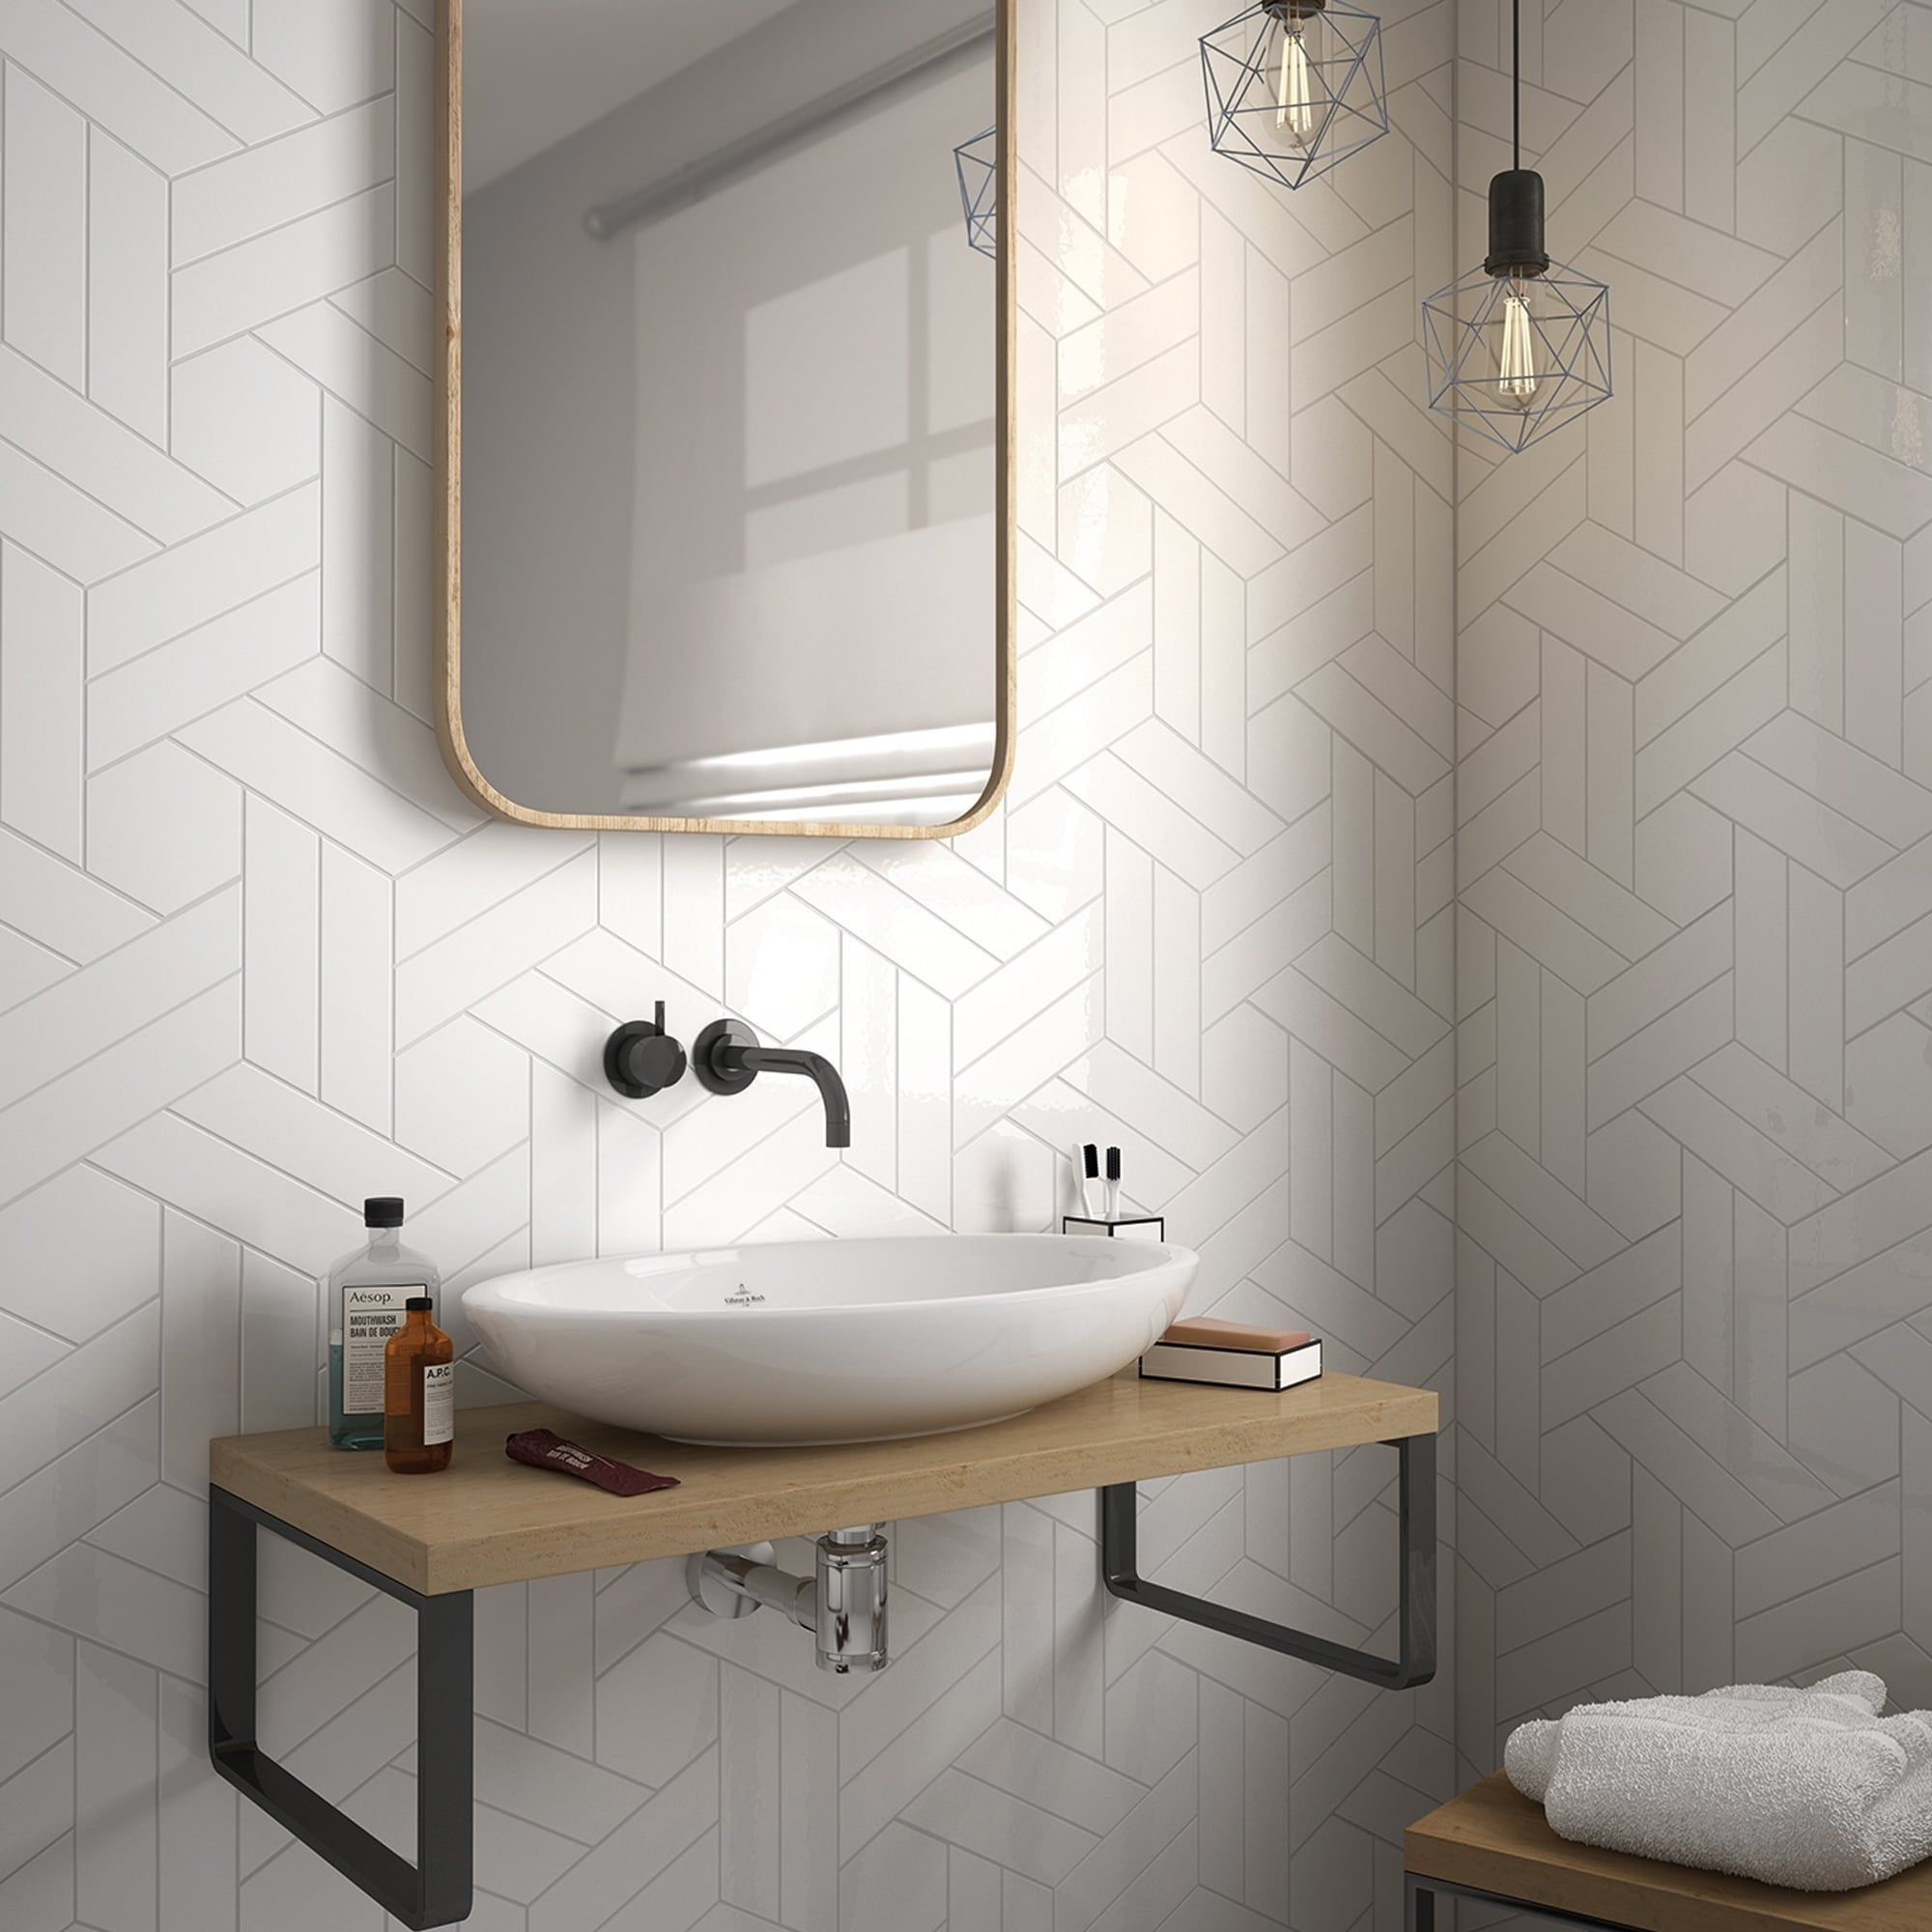 Chevron White Left 18.6 x 5.2cm Wall Tile PER BOX | Home * Bed, Bath ...